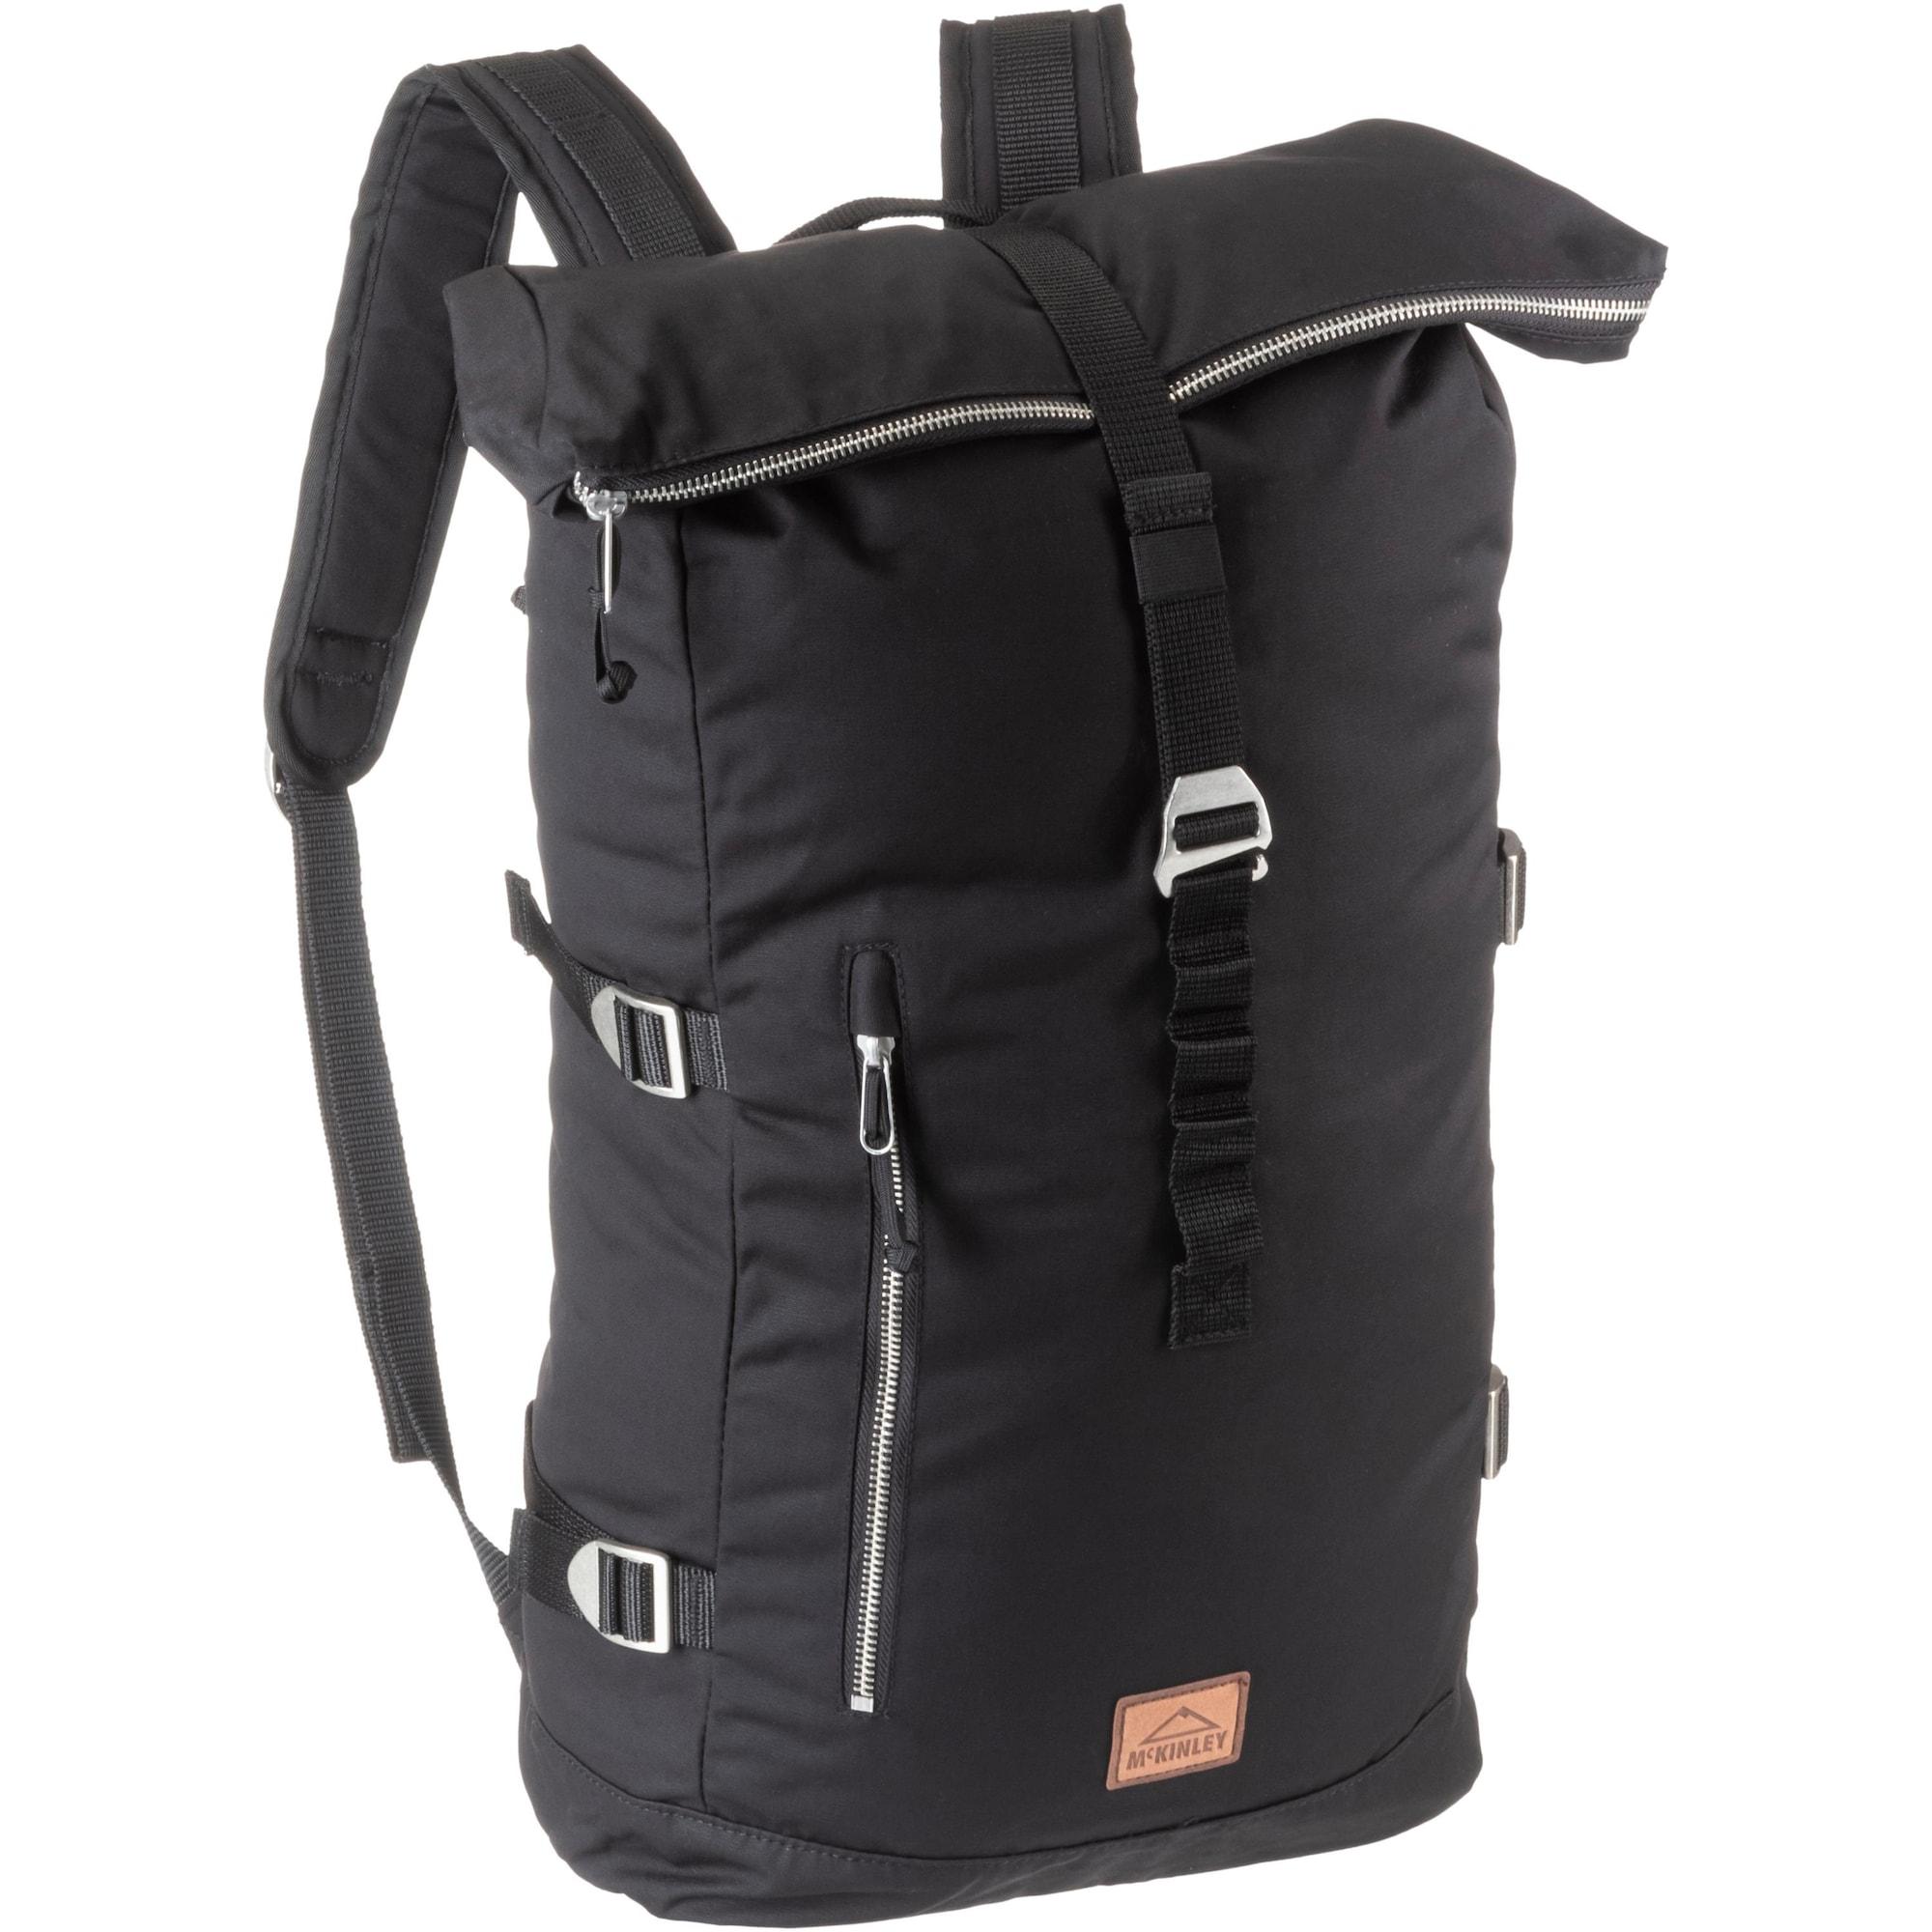 Daypack 'Daybag London Rolltop 32L' | Taschen > Rucksäcke > Tourenrucksäcke | mckinley